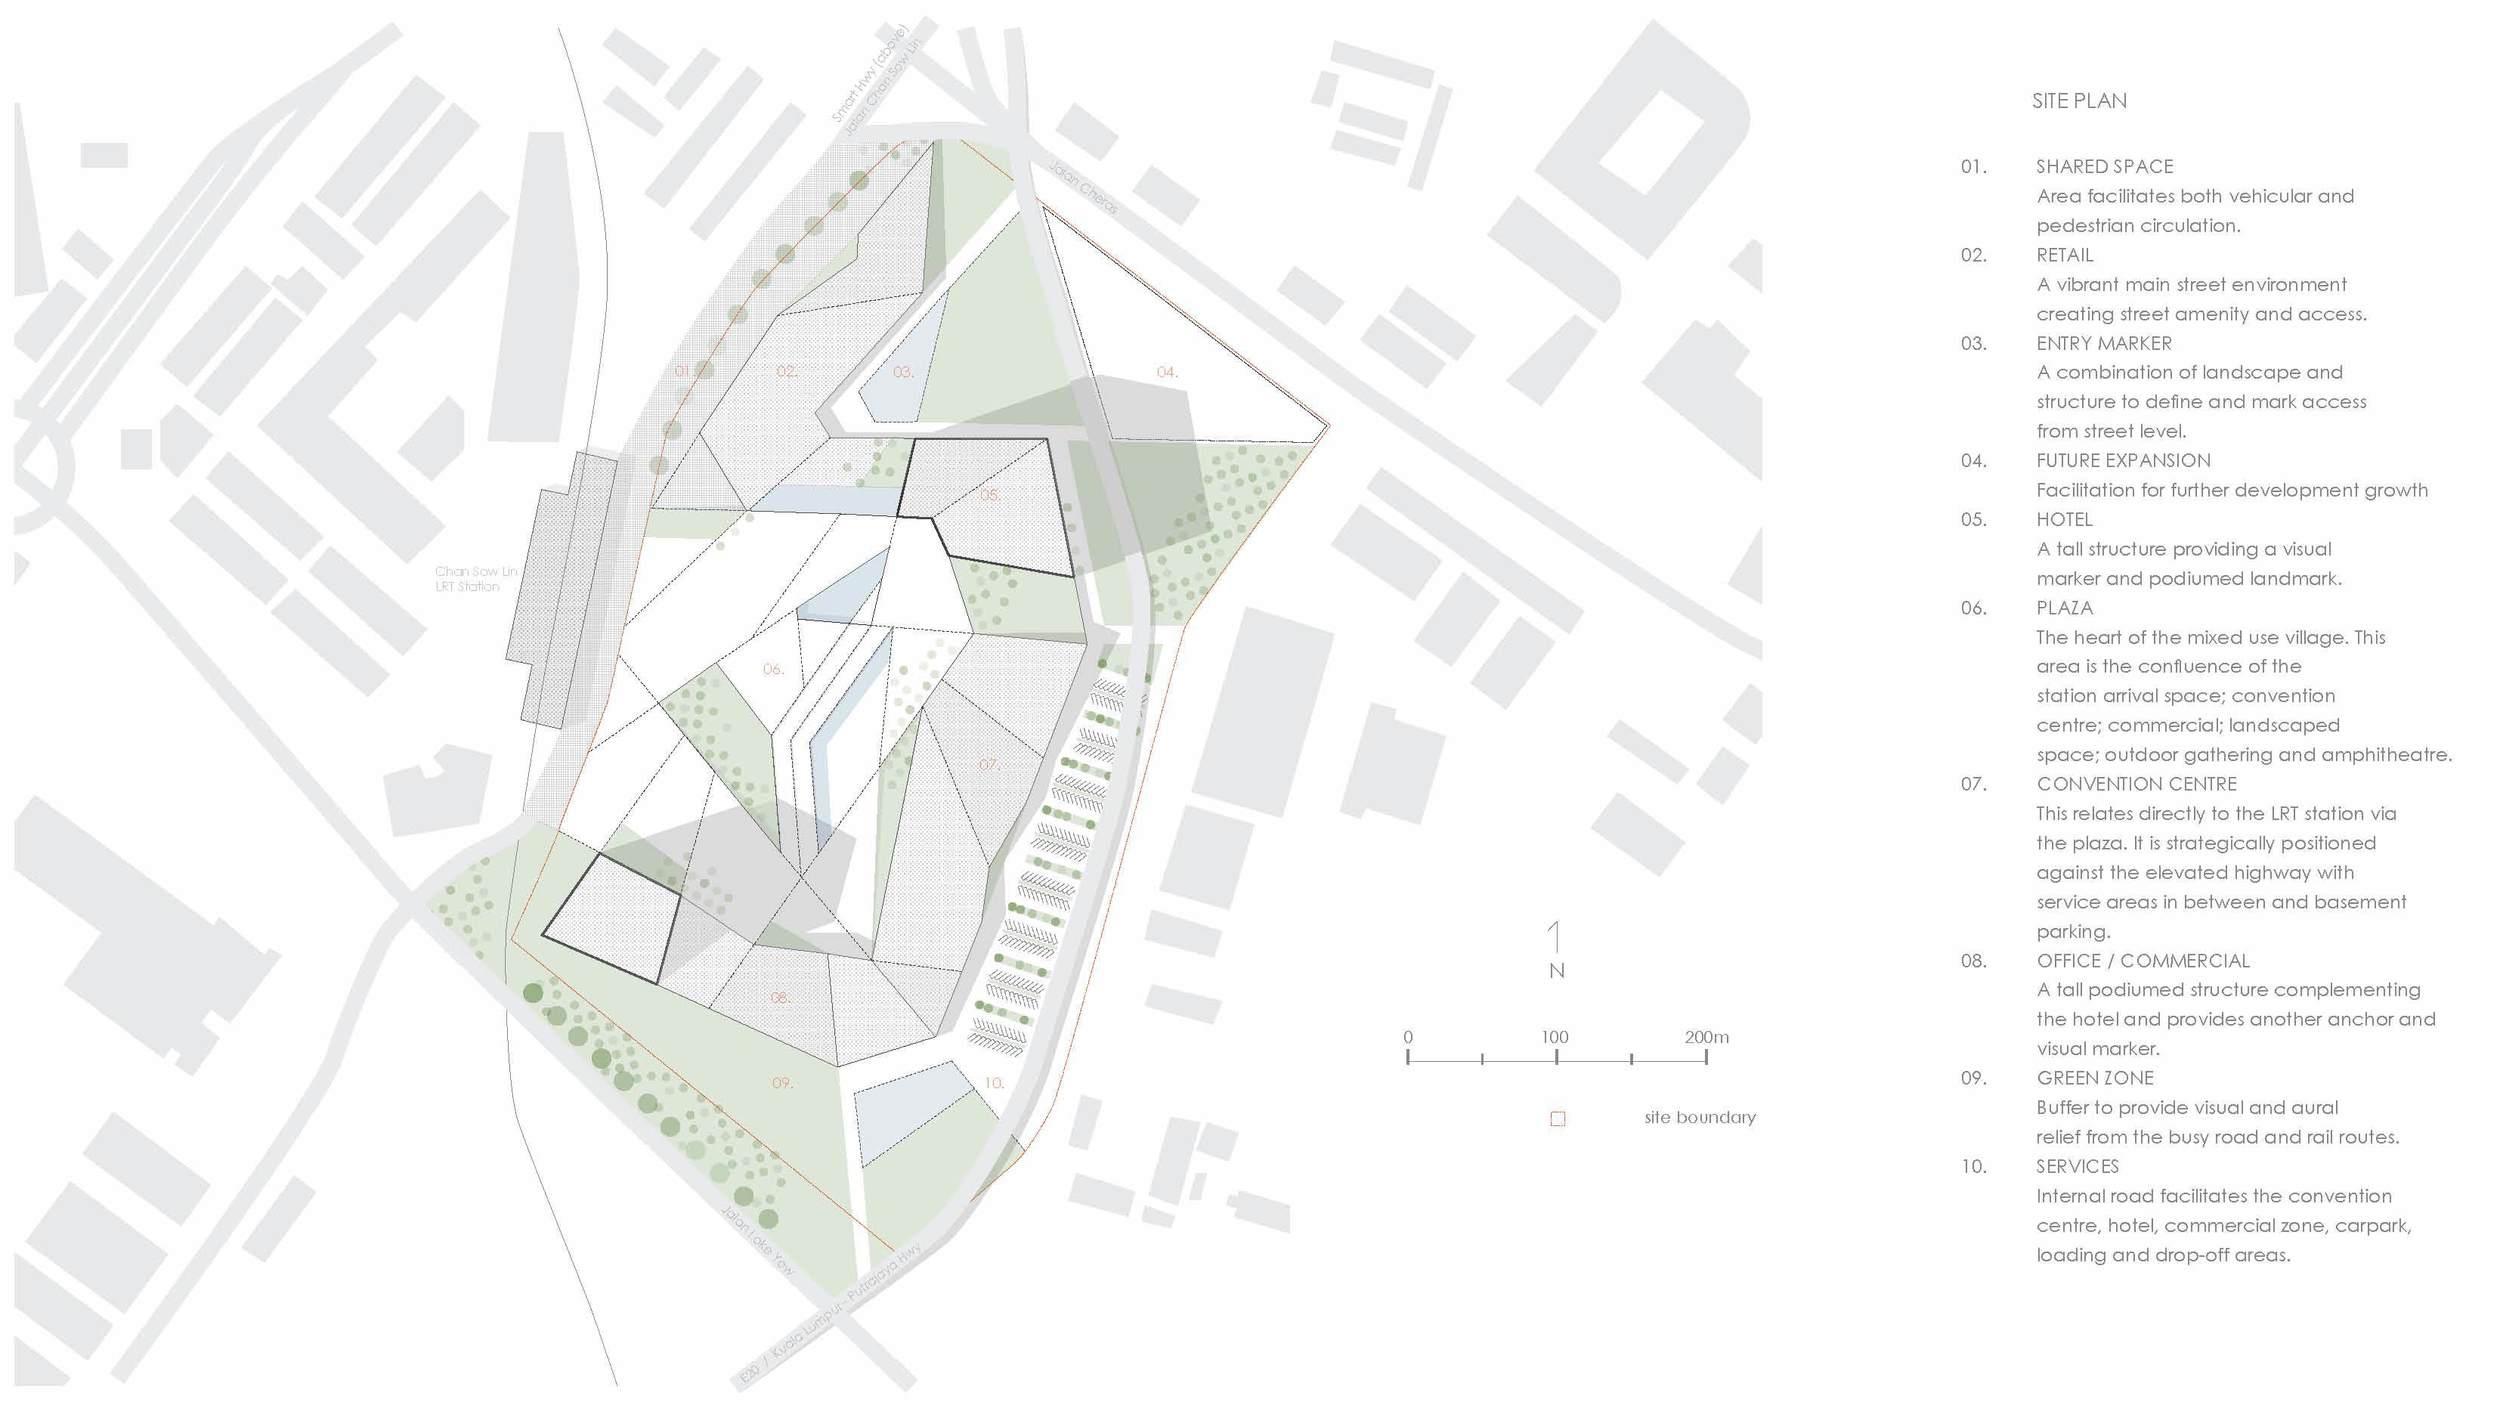 CIDB_Redevlopment Concept Proposal_Final_Page_03.jpg